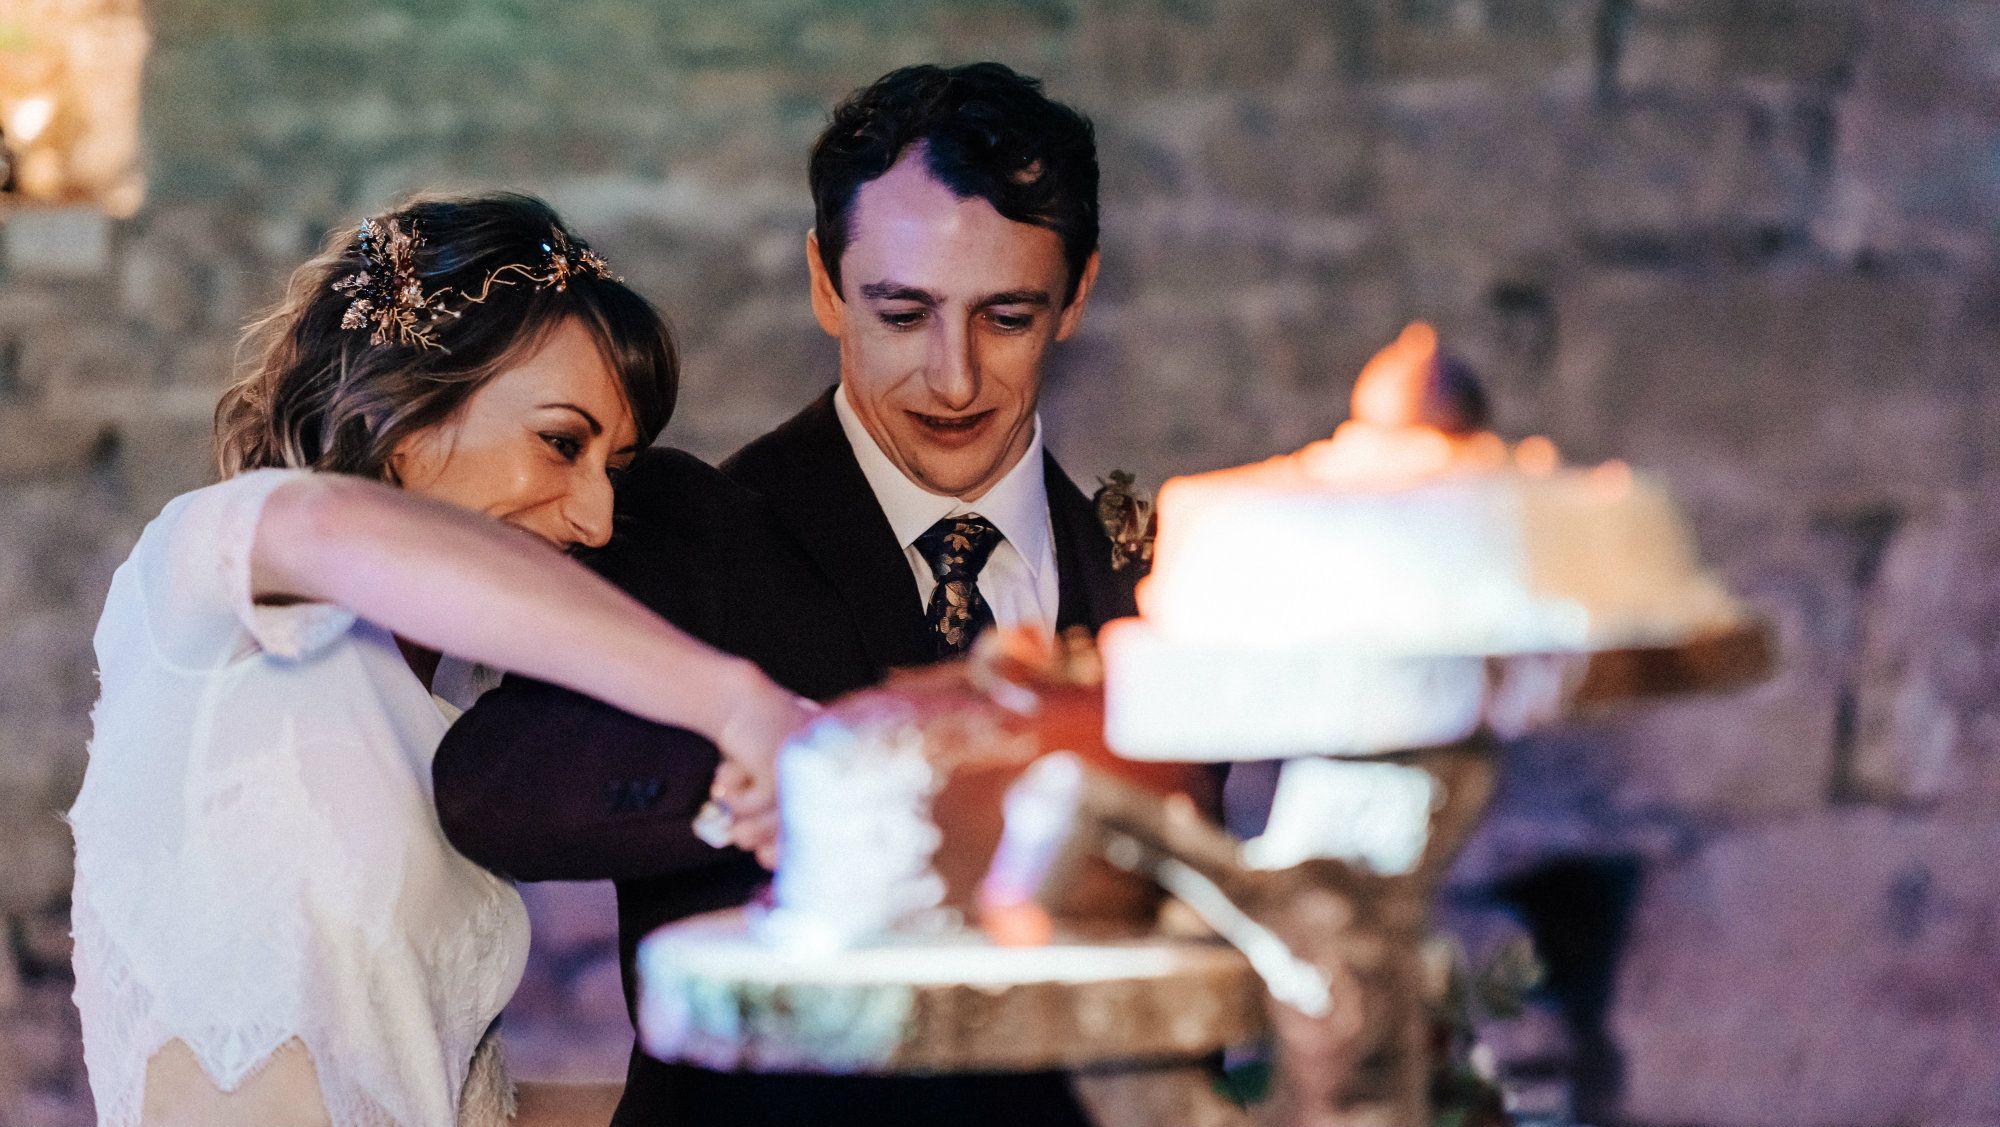 Bridal-wedding-occasion-hair-accessories-UK-gold-leaf-SRA-57.2